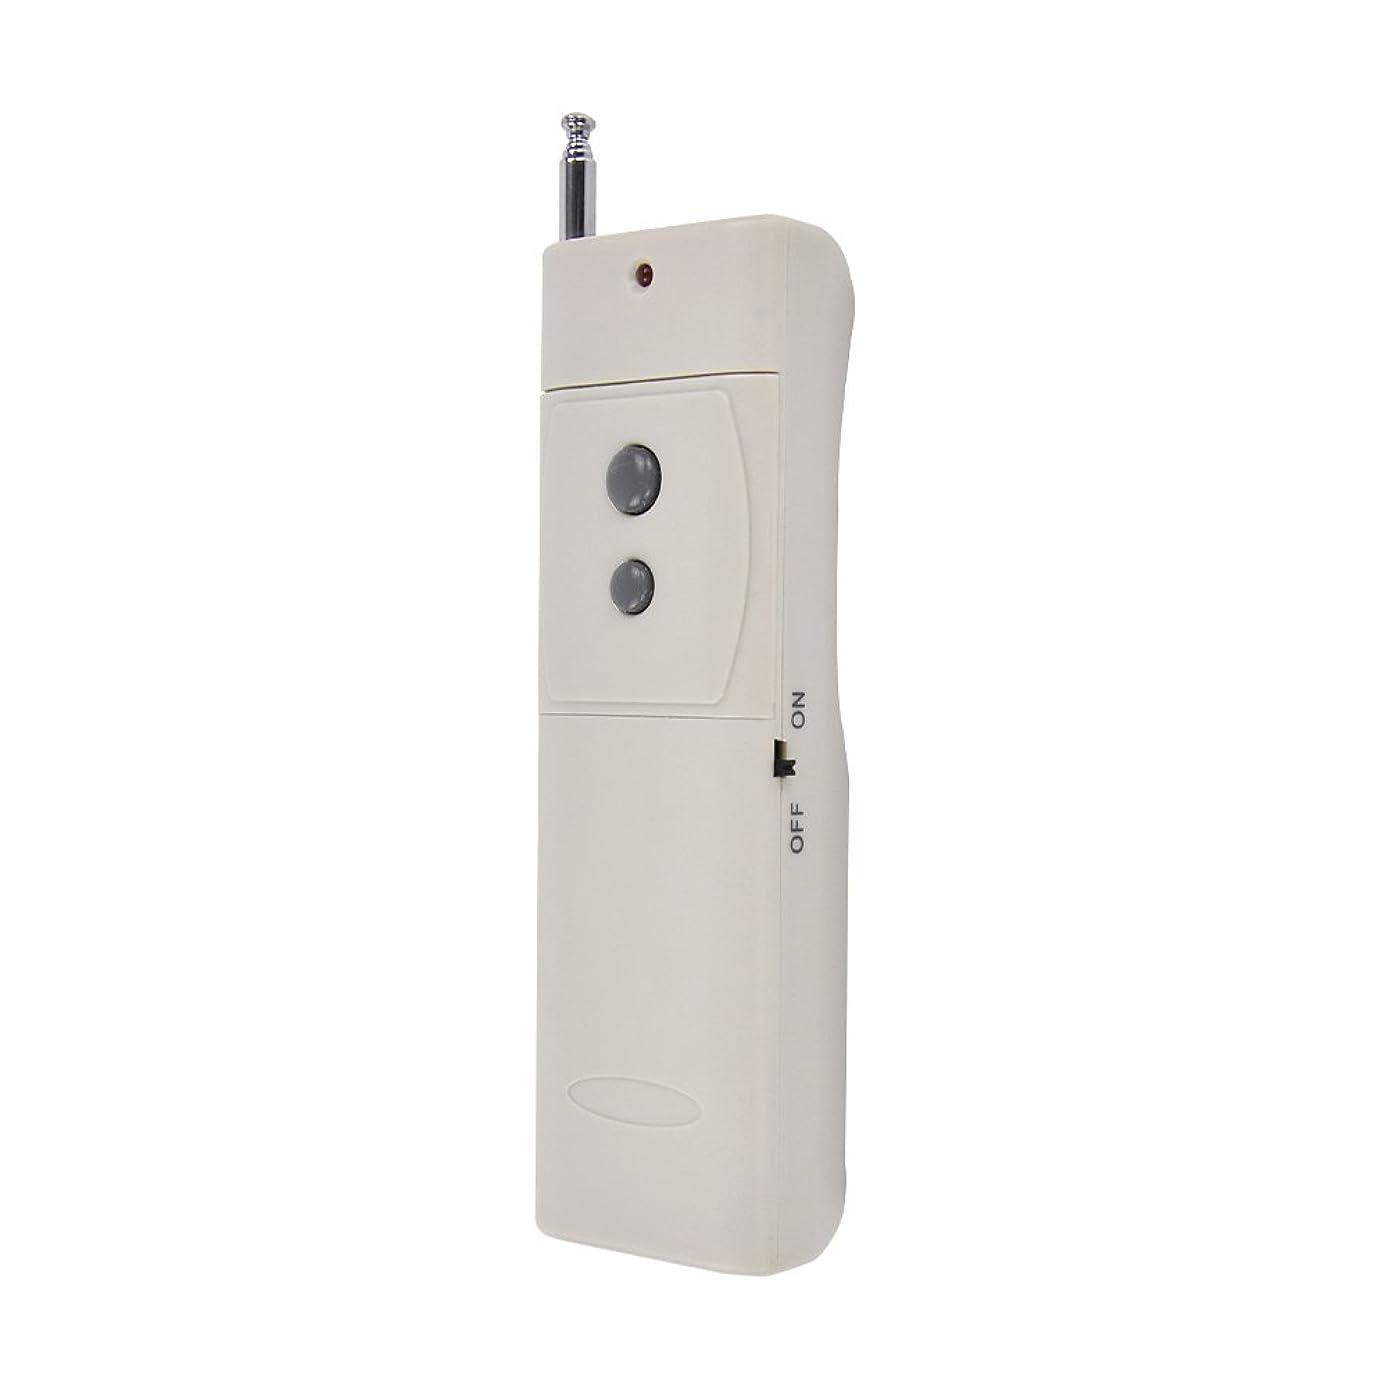 Sound Light Alarm Remote Control